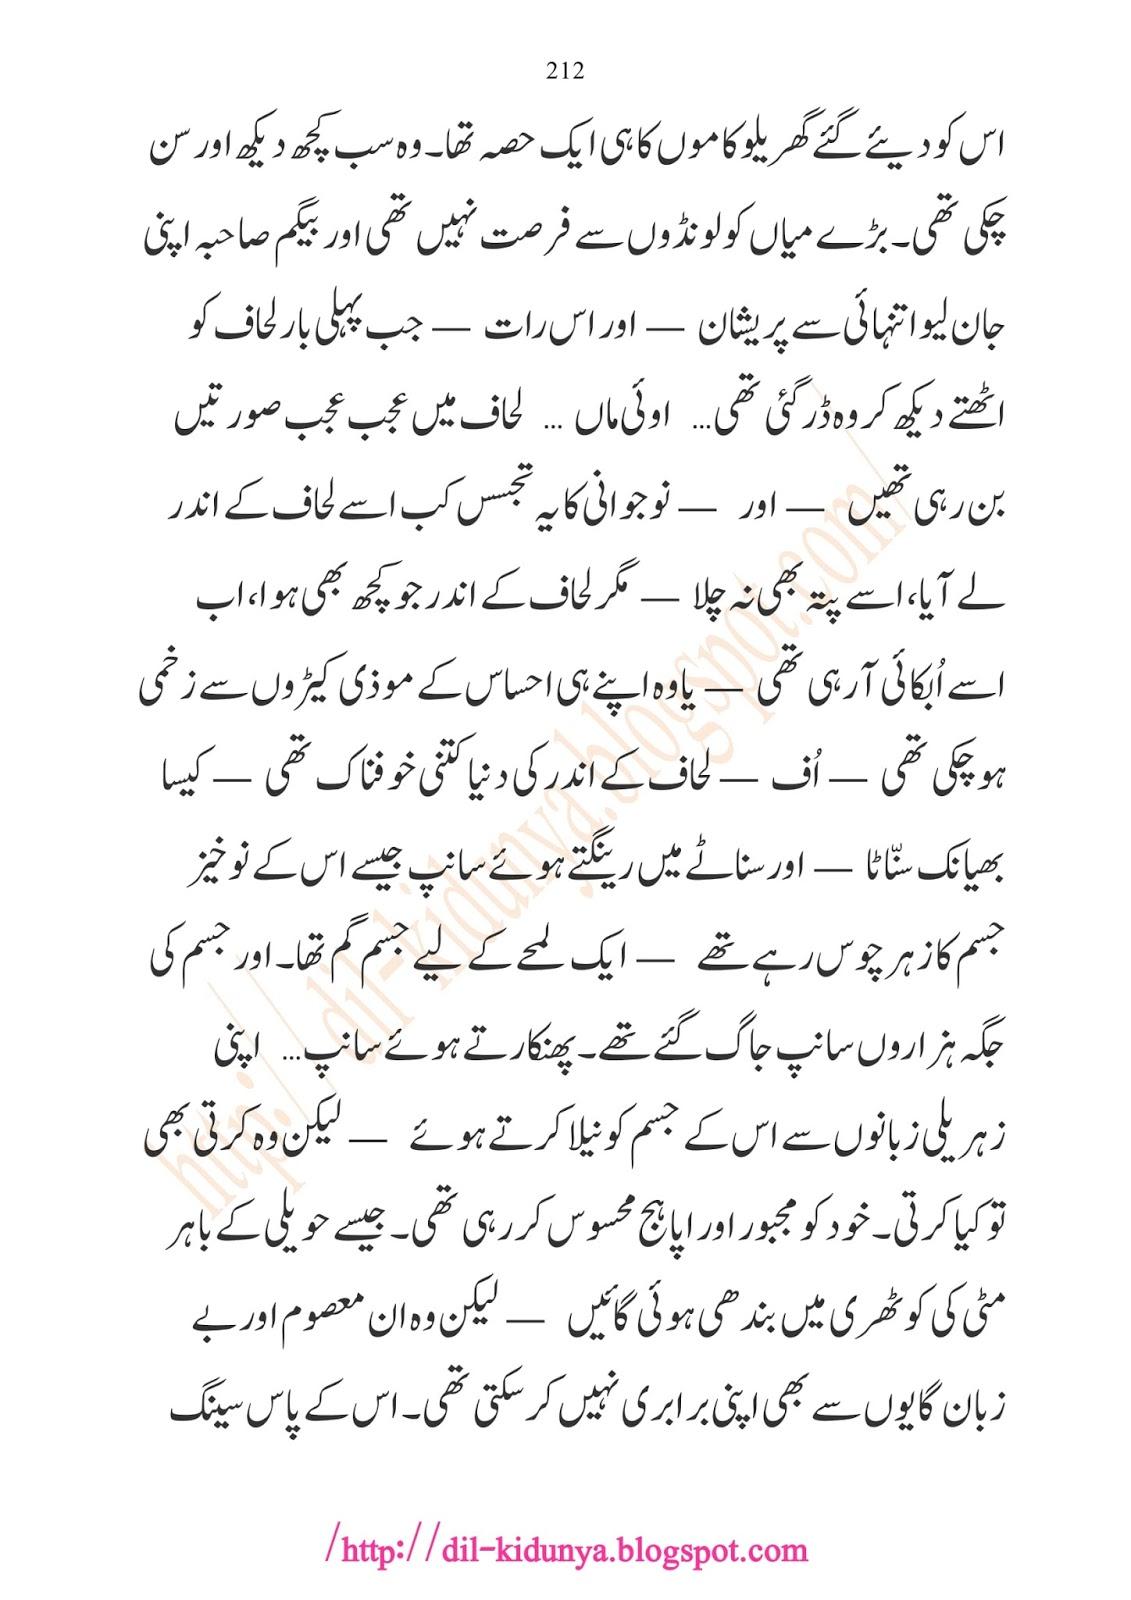 Pdf urdu stories ismat chughtai short in